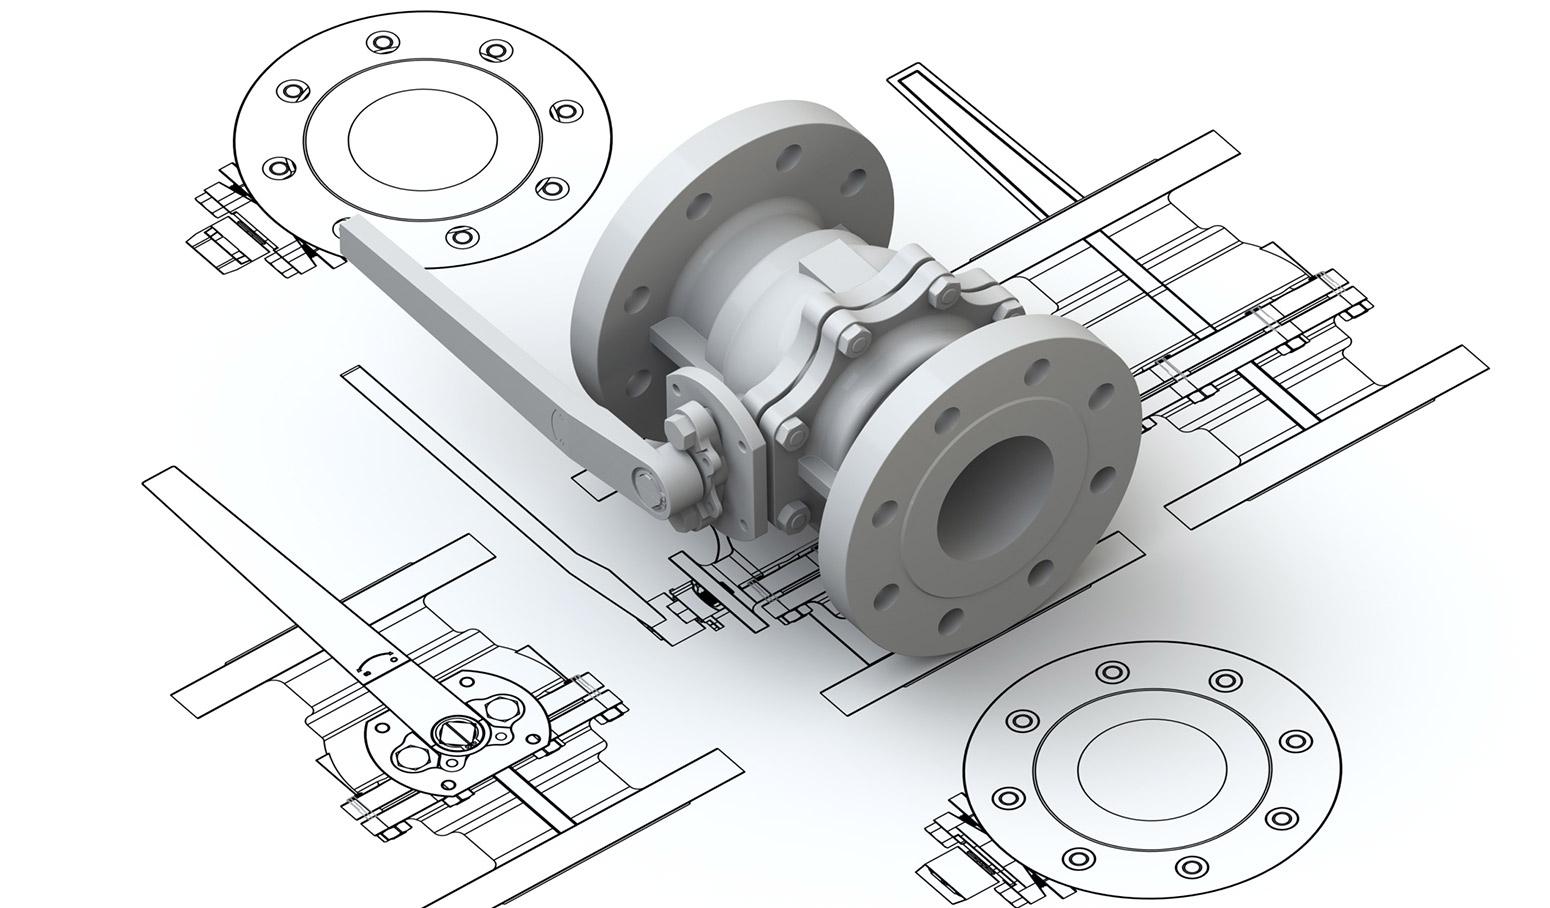 3d-parts-printing